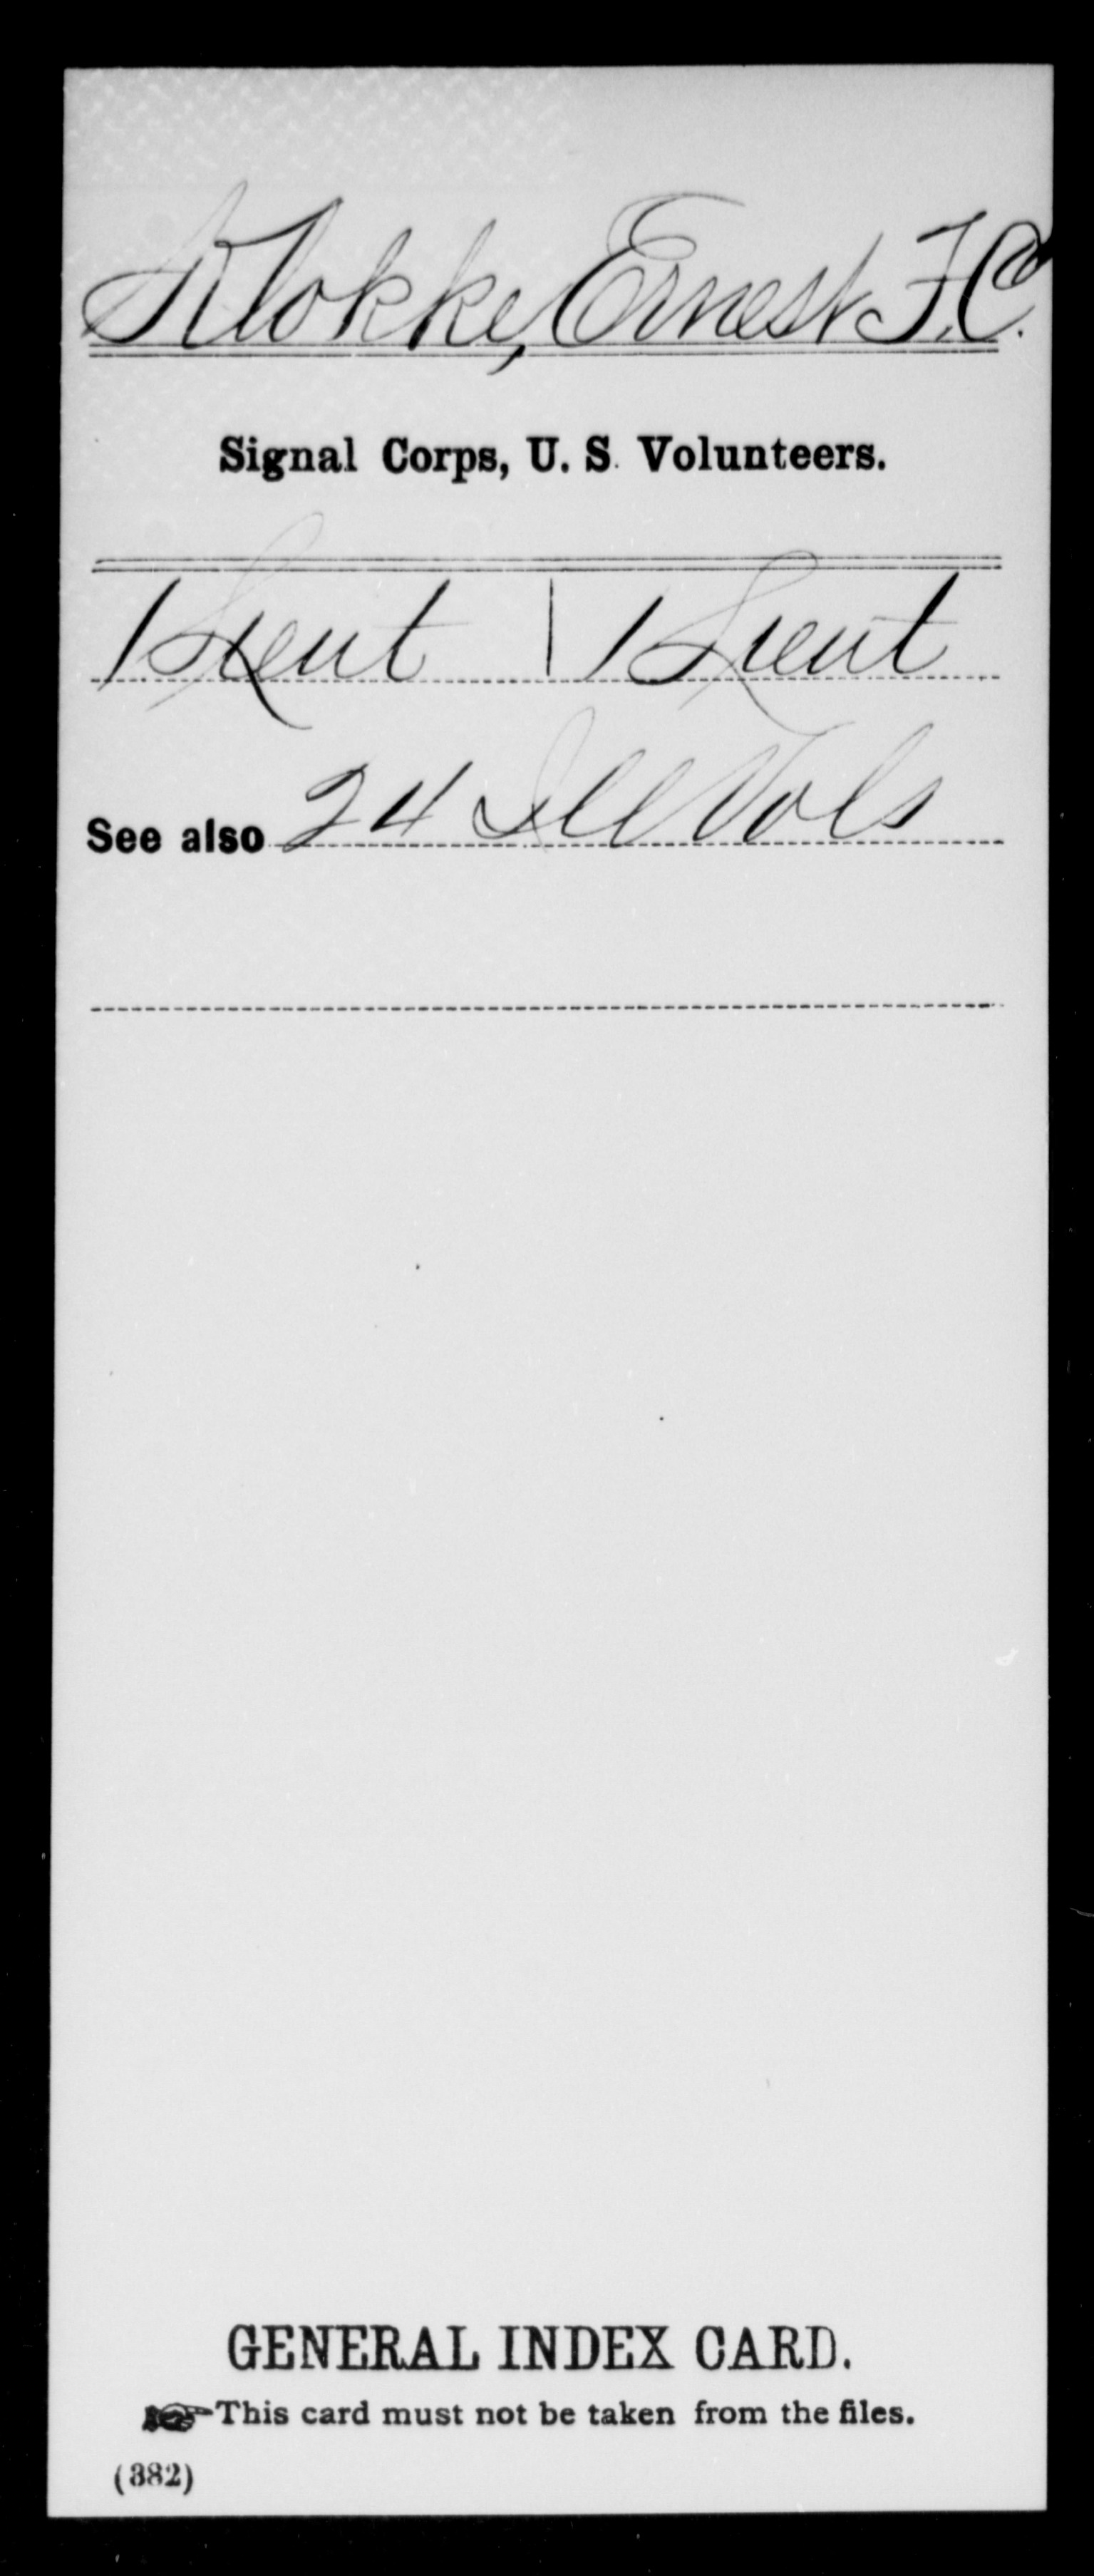 Klokke, Ernest F C - US Volunteers, Signal Corps